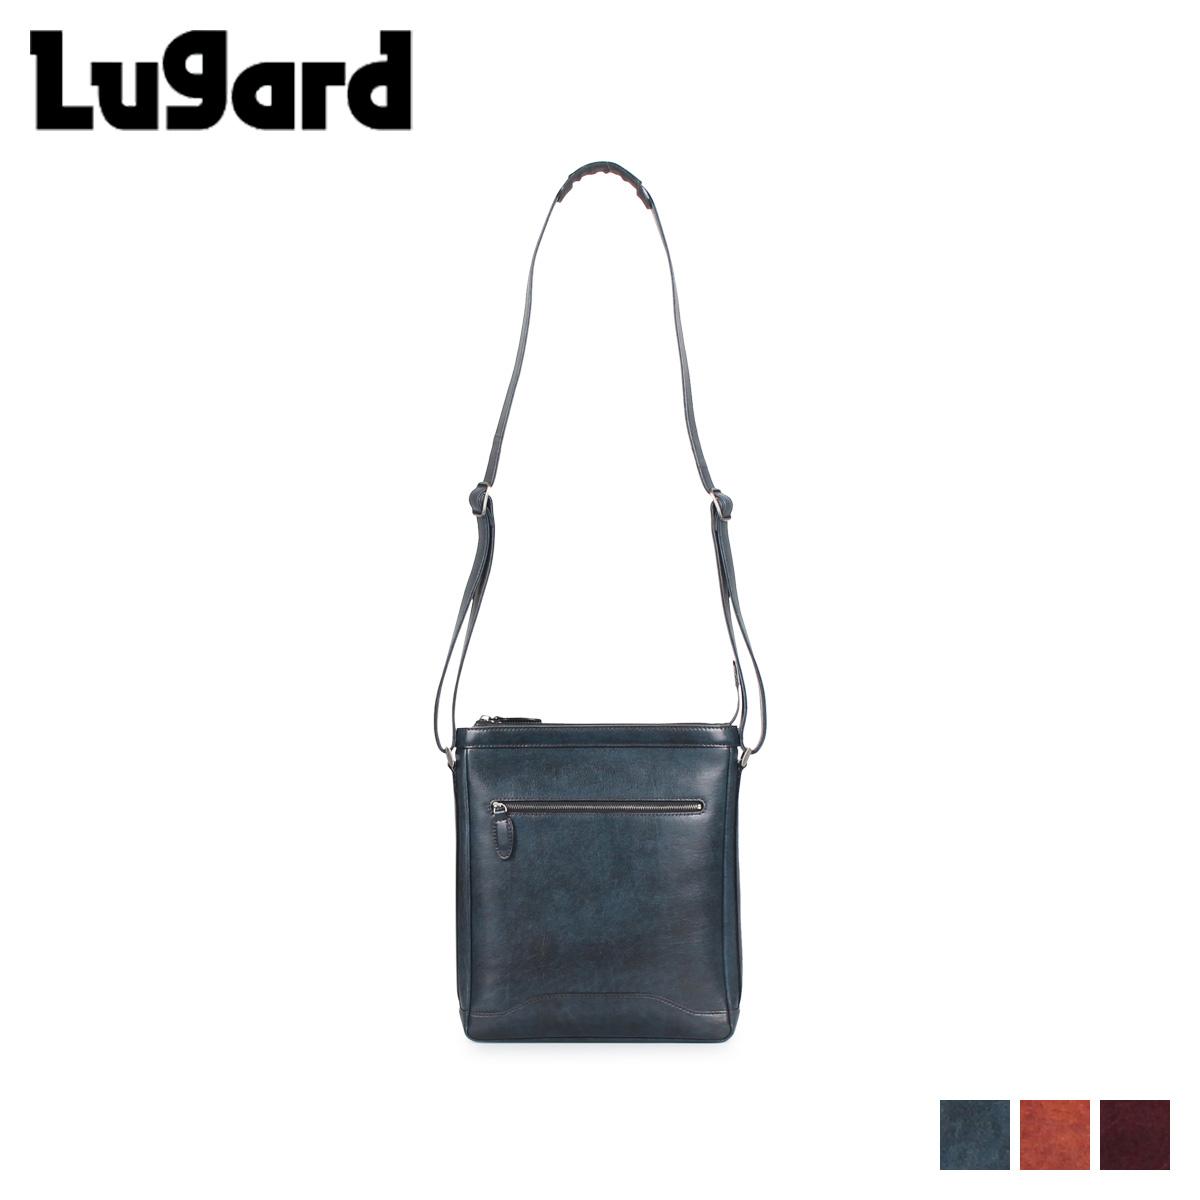 Lugard ラガード 青木鞄 ジースリー バッグ ショルダーバッグ メンズ G3 SHOULDER BAG ネイビー ブラウン ボルドー 5227